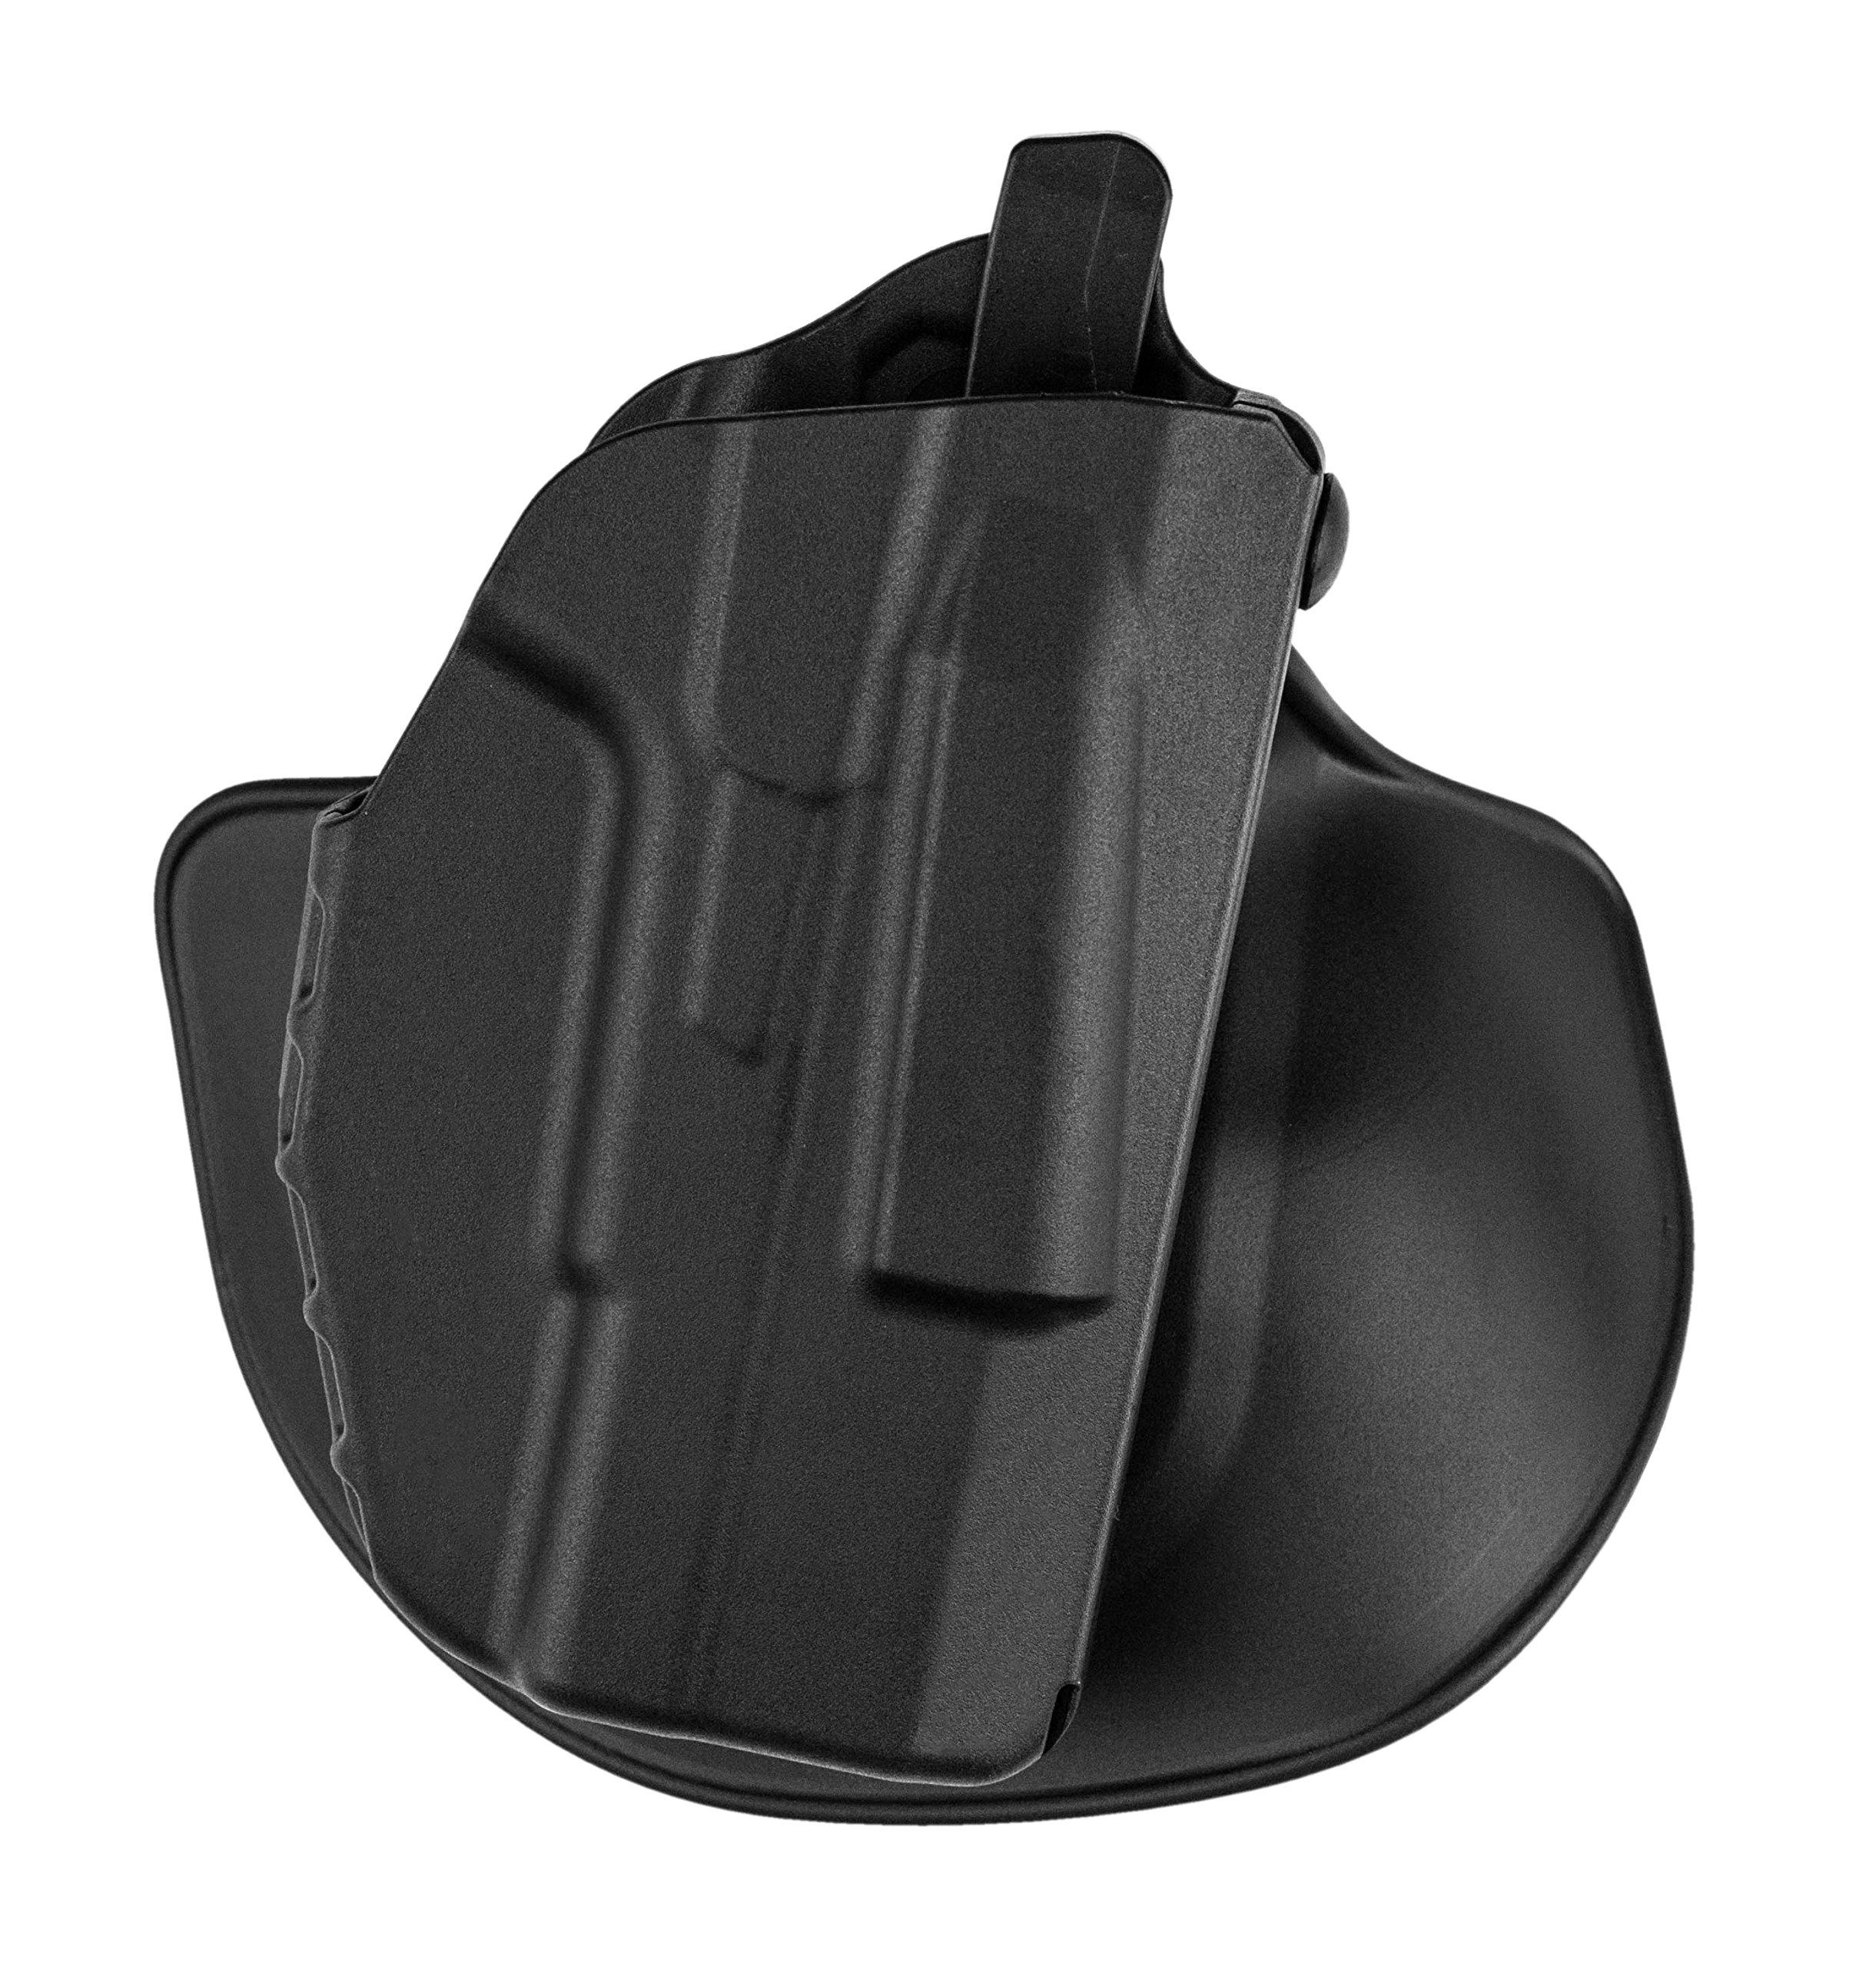 Safariland 7378 7TS ALS Slim, Flexible Paddle & Belt Loop Concealment Holster, SafariSeven Black, Right Hand, Glock 43 9mm